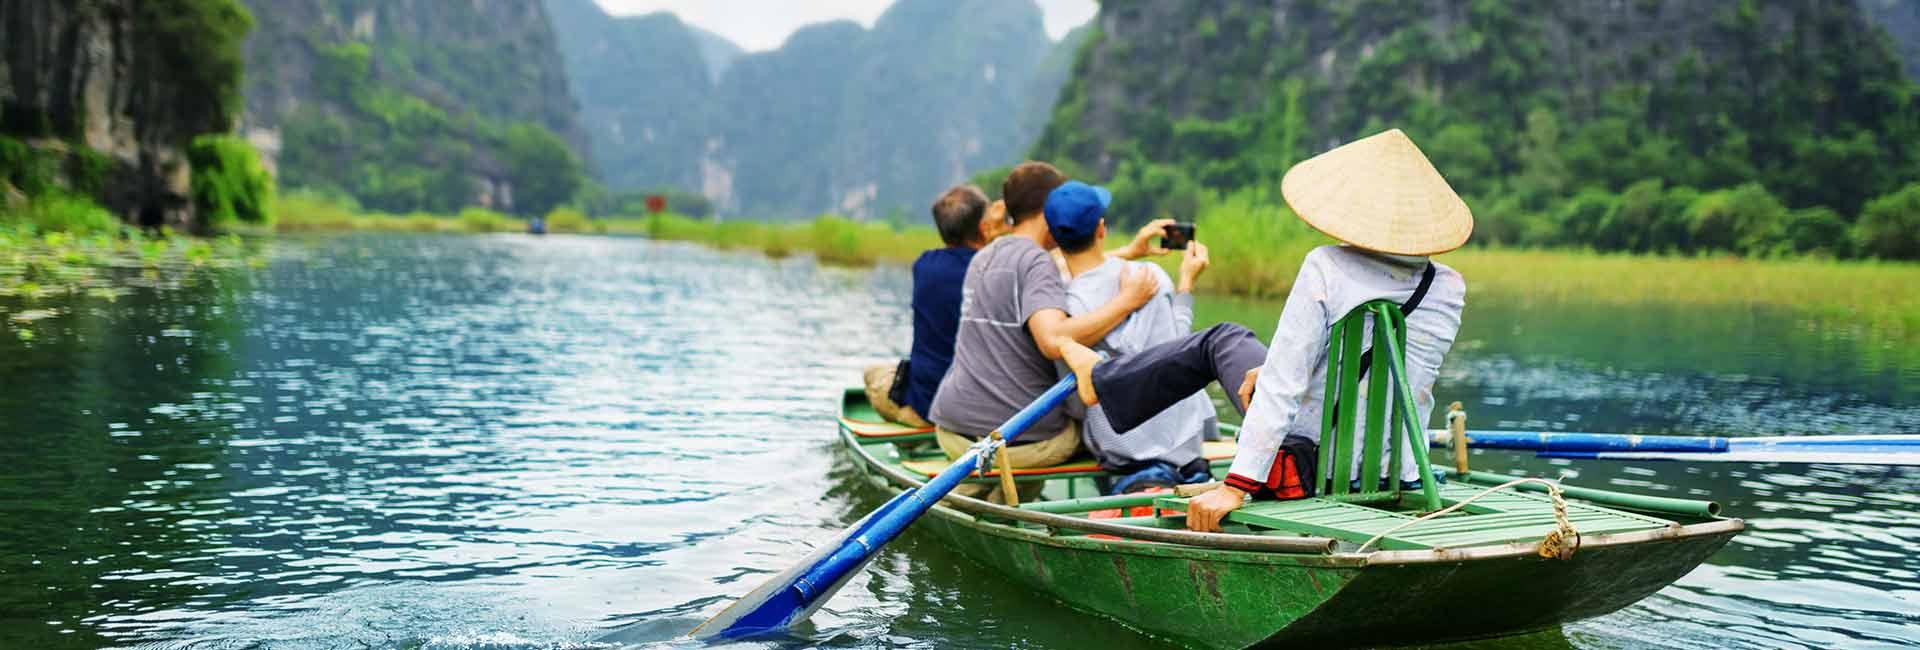 servicii turism smart tours brasov